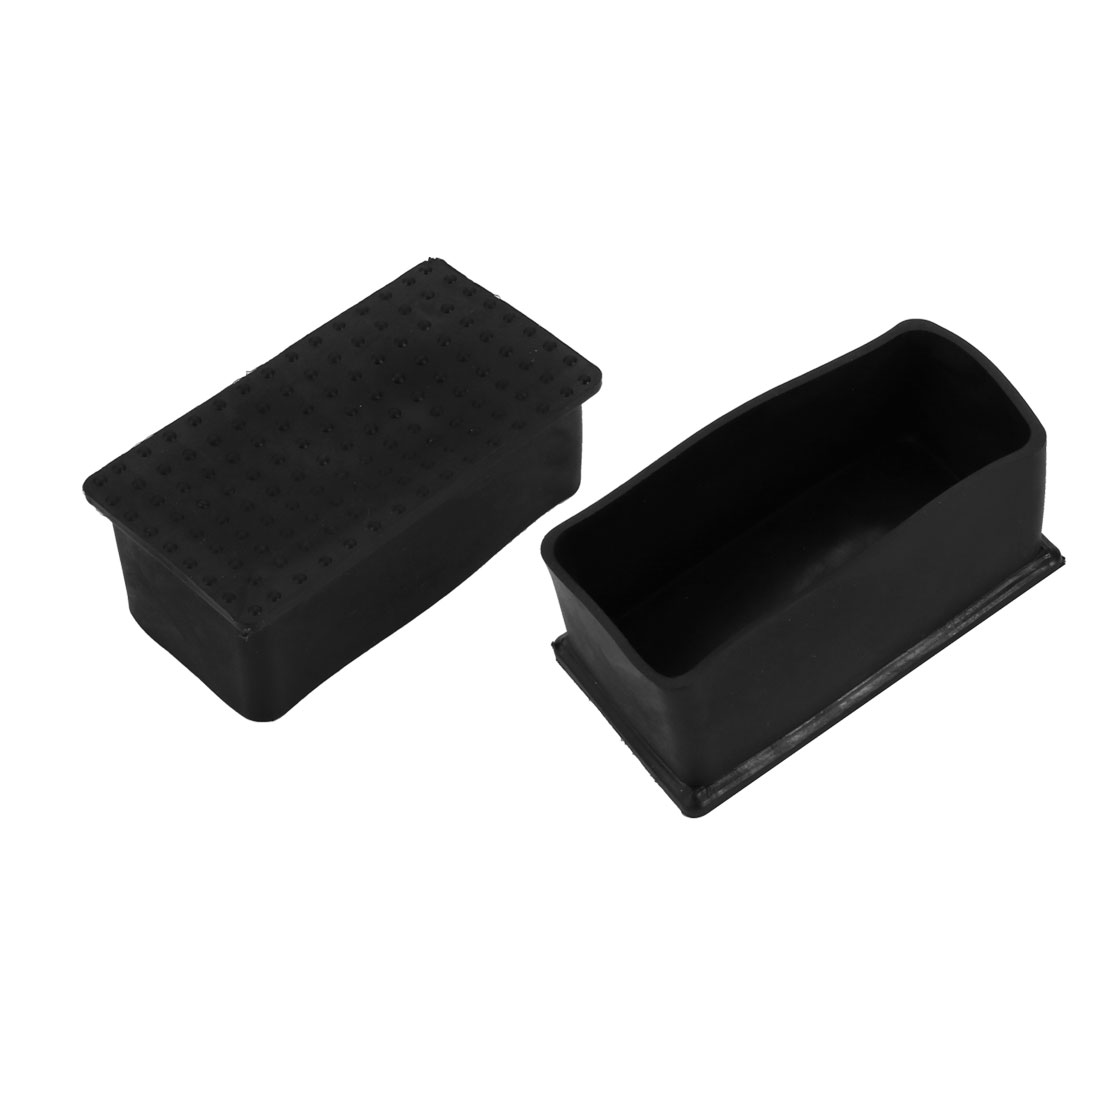 2pcs 38x78mm Black PVC Rubber Rectangle Cabinet Chair Leg Insert Cover Protector